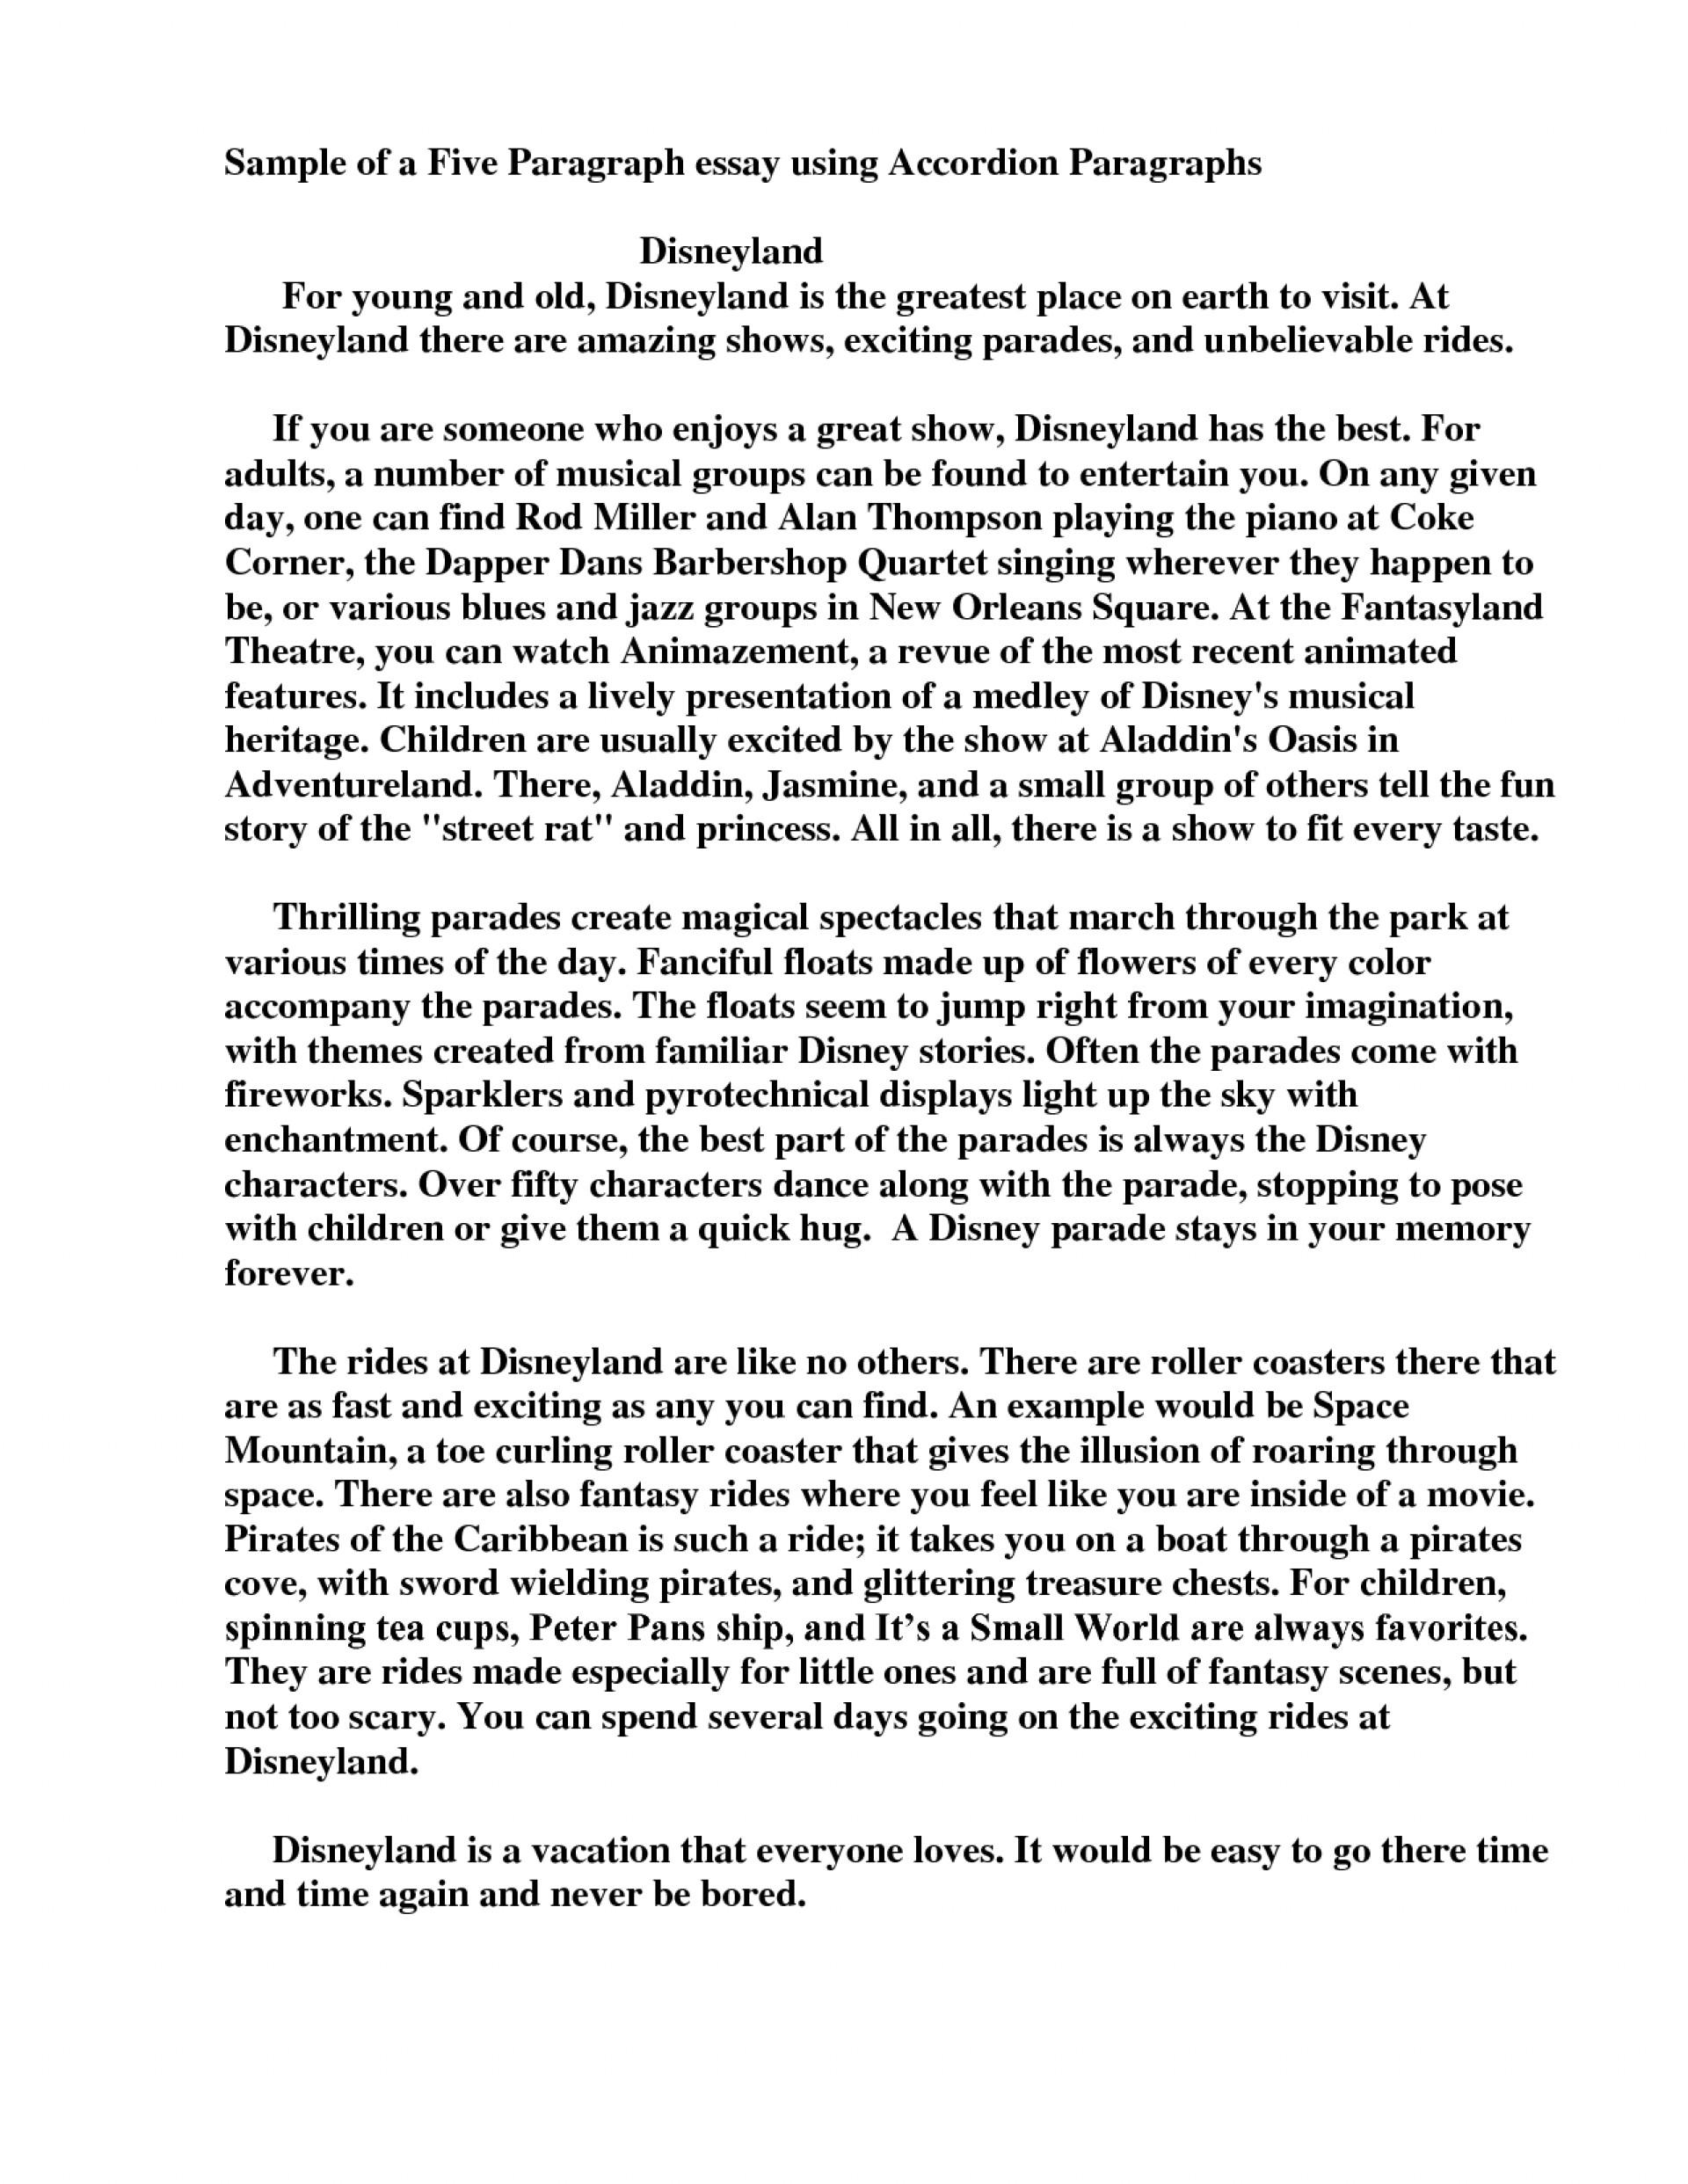 004 Format Of Paragraph Essay Inspirational Sample Five Stirring 5 Example High School Pdf Argumentative Outline Template 1920